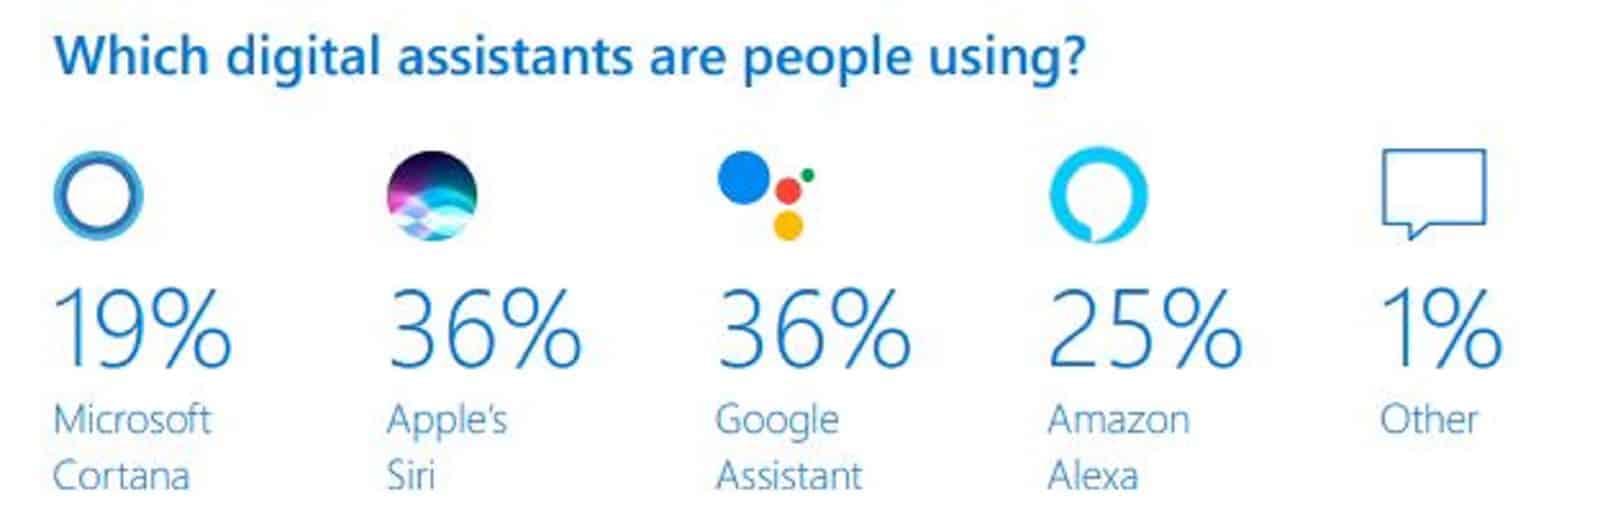 Microsoft Digital Assistant Report 2019 3